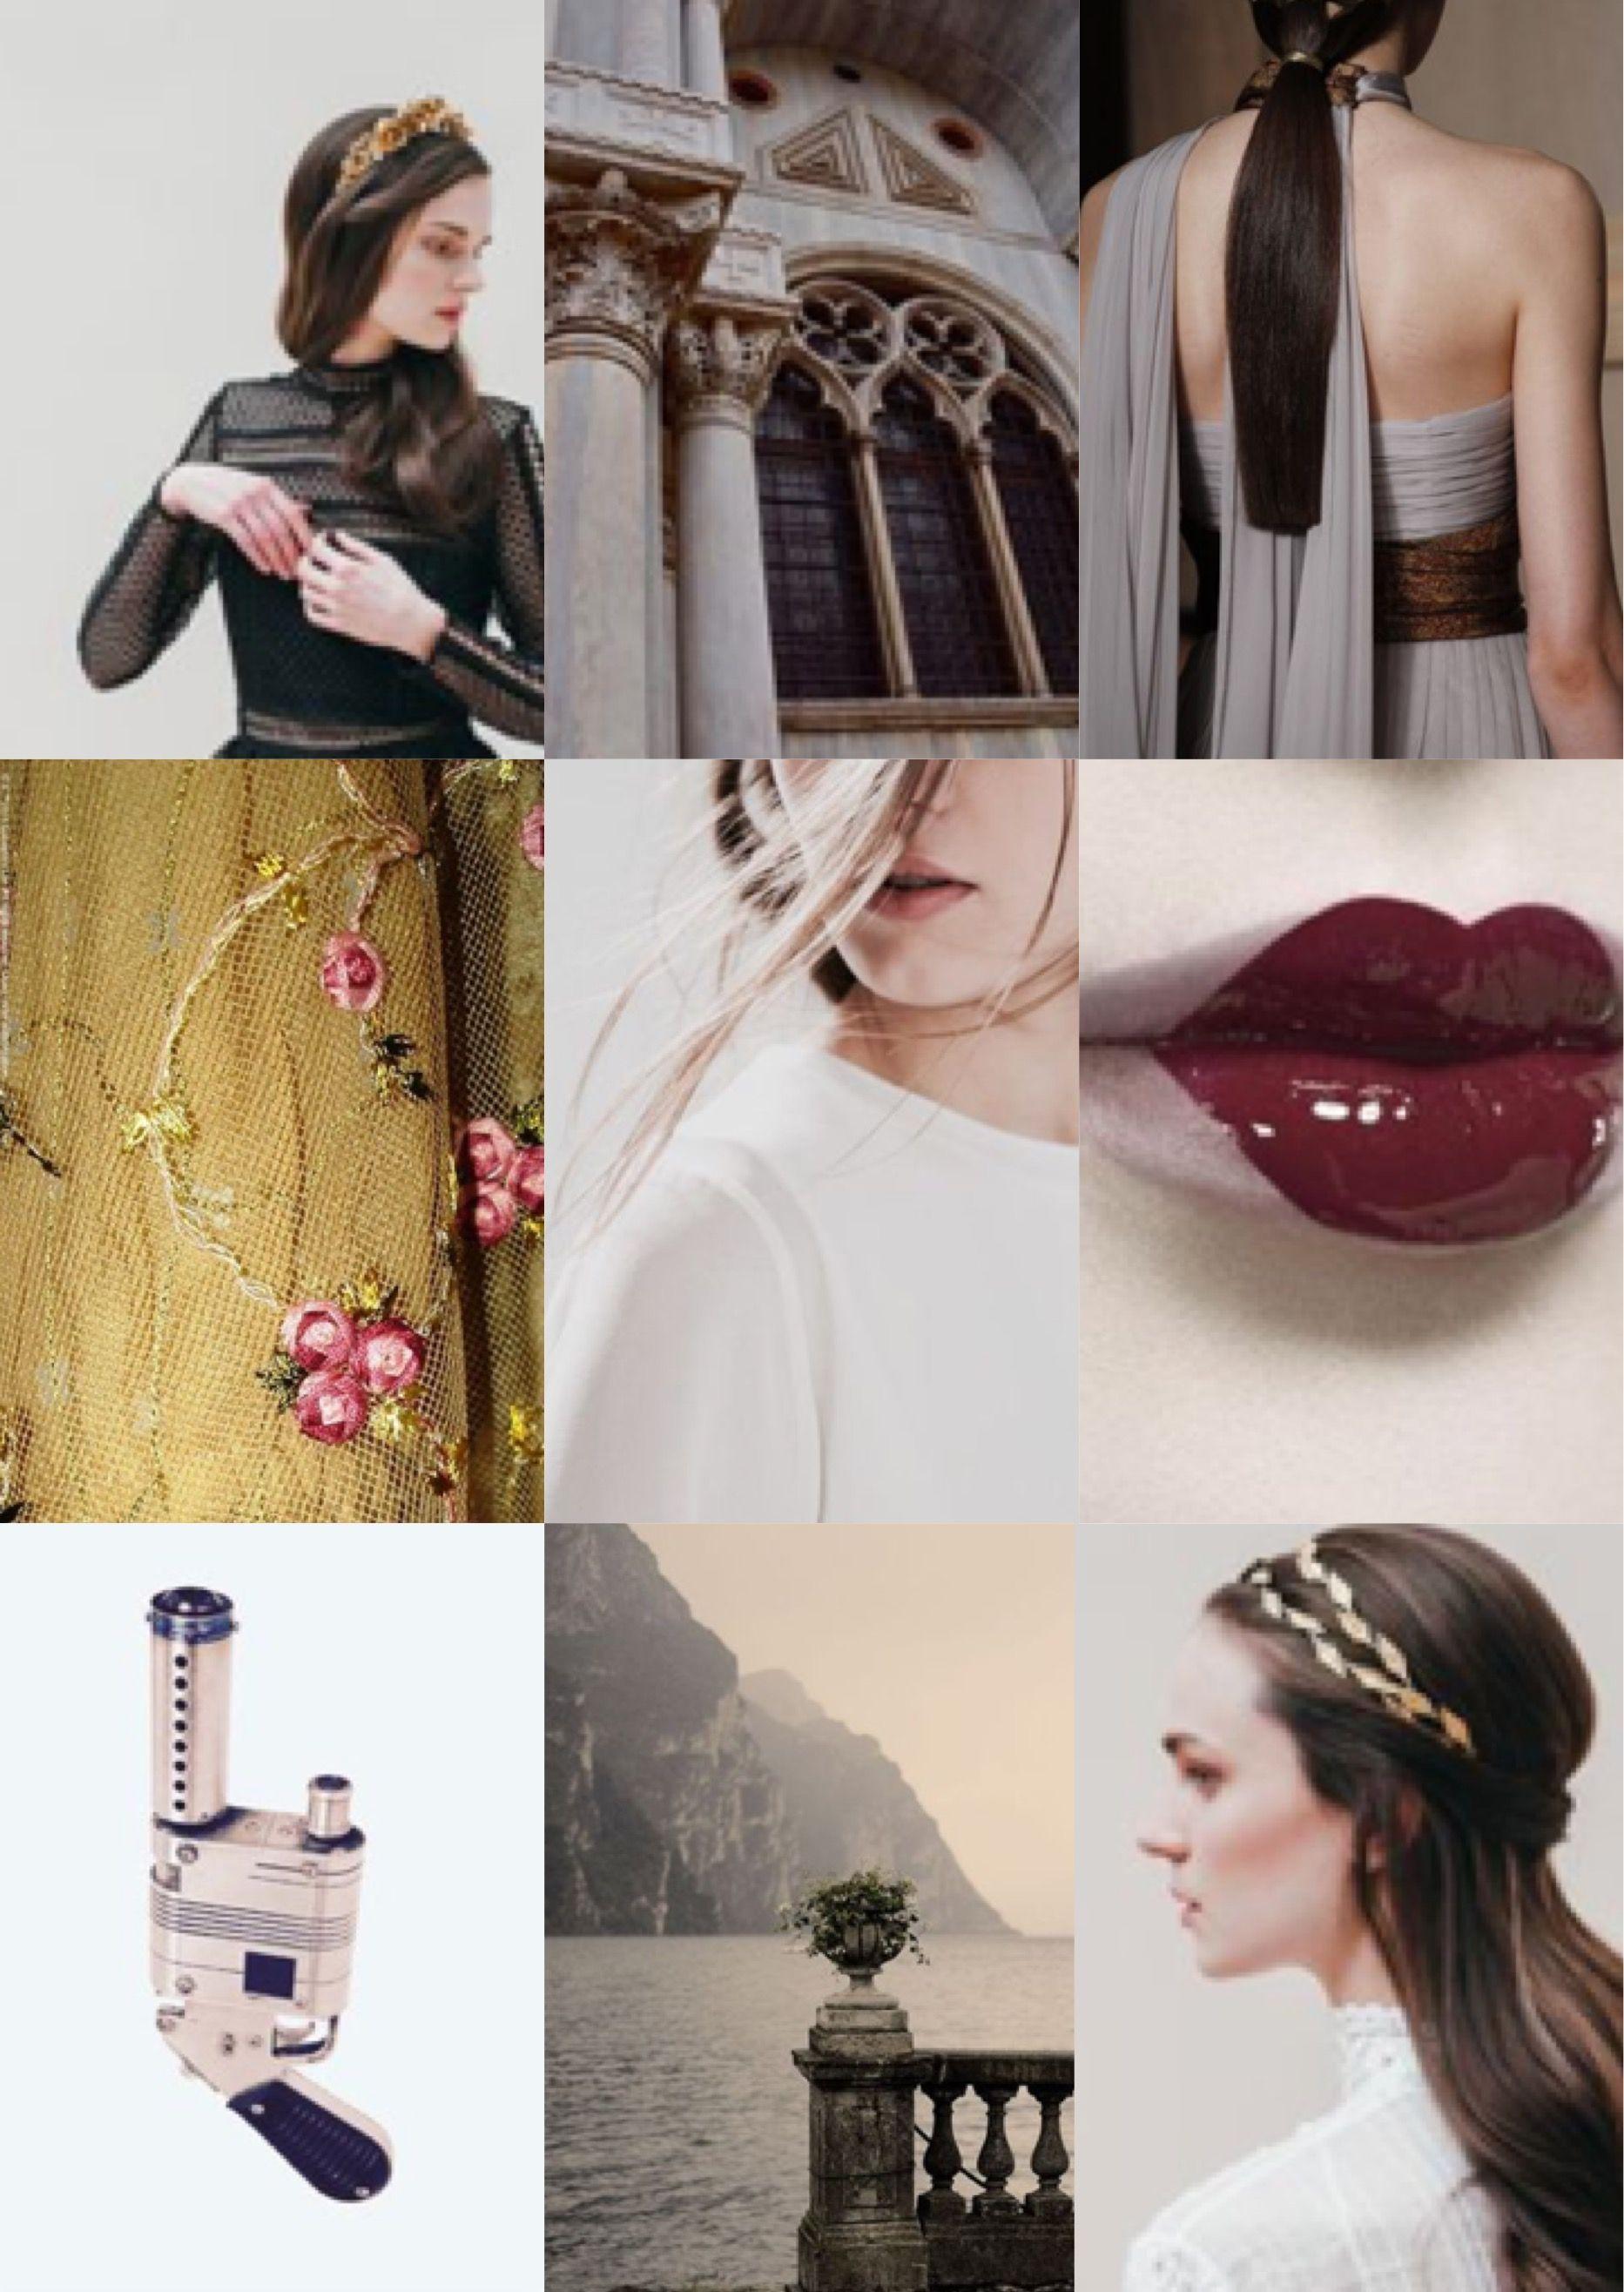 Jyn Erso Star Wars aesthetic inspiration | Aesthetic, Star